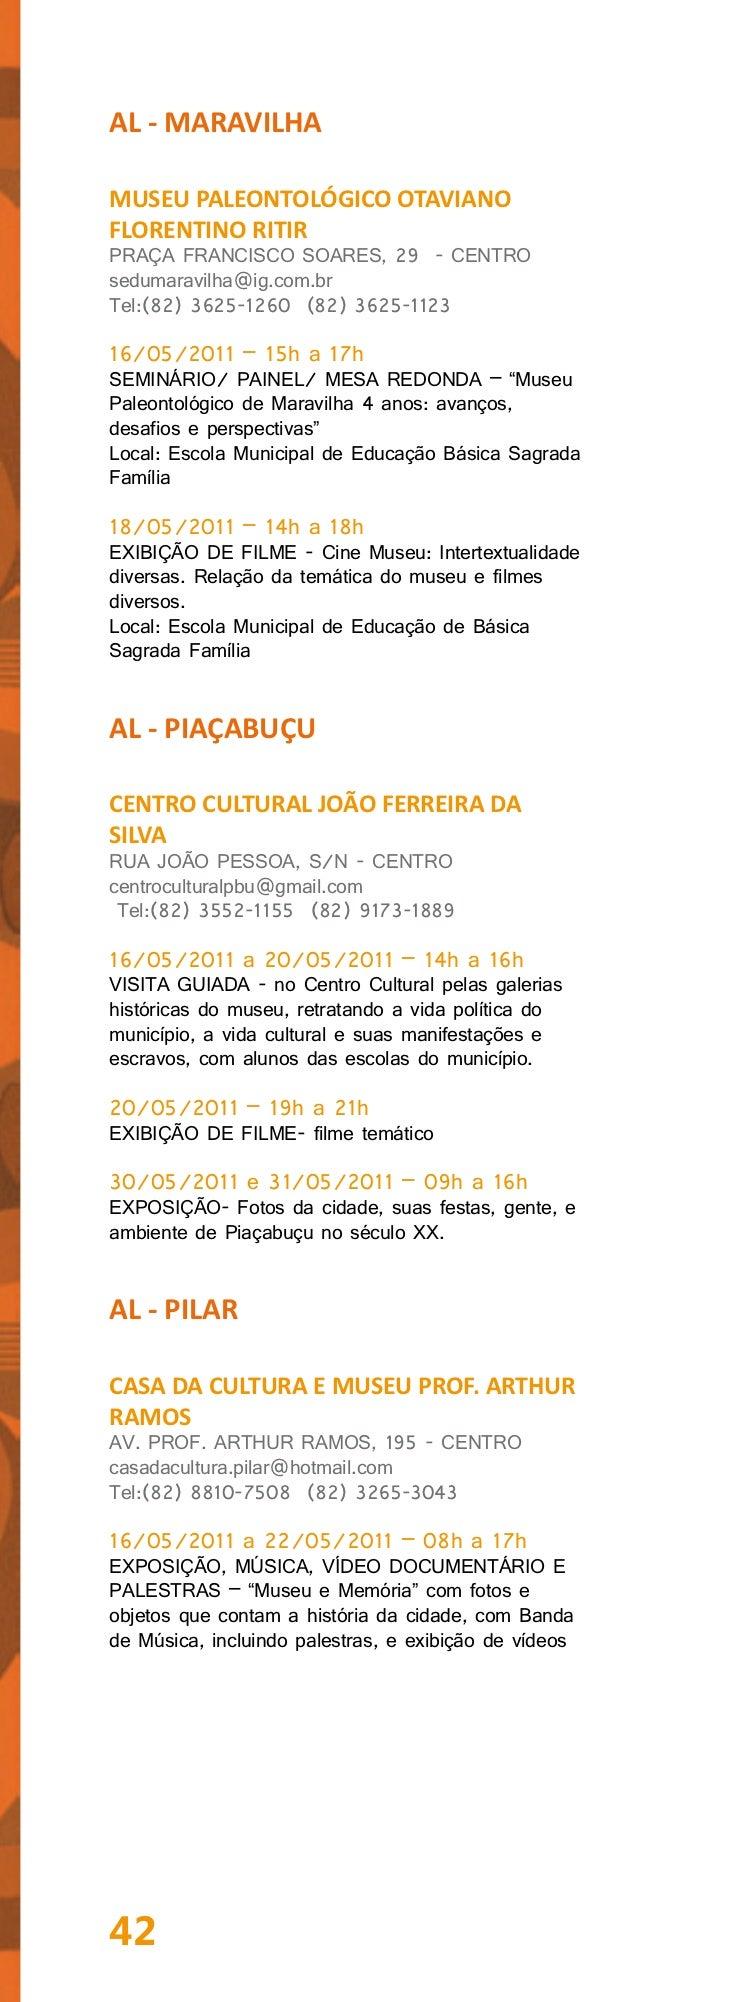 AL - SÃO MIGUEL DOS CAMPOSMUSEU HISTÓRICO E CULTURAL FERNANDOLOPESRUA: VISCONDE DE SINIMBÚ, 60 - CENTROcasadaculturasmc@ya...